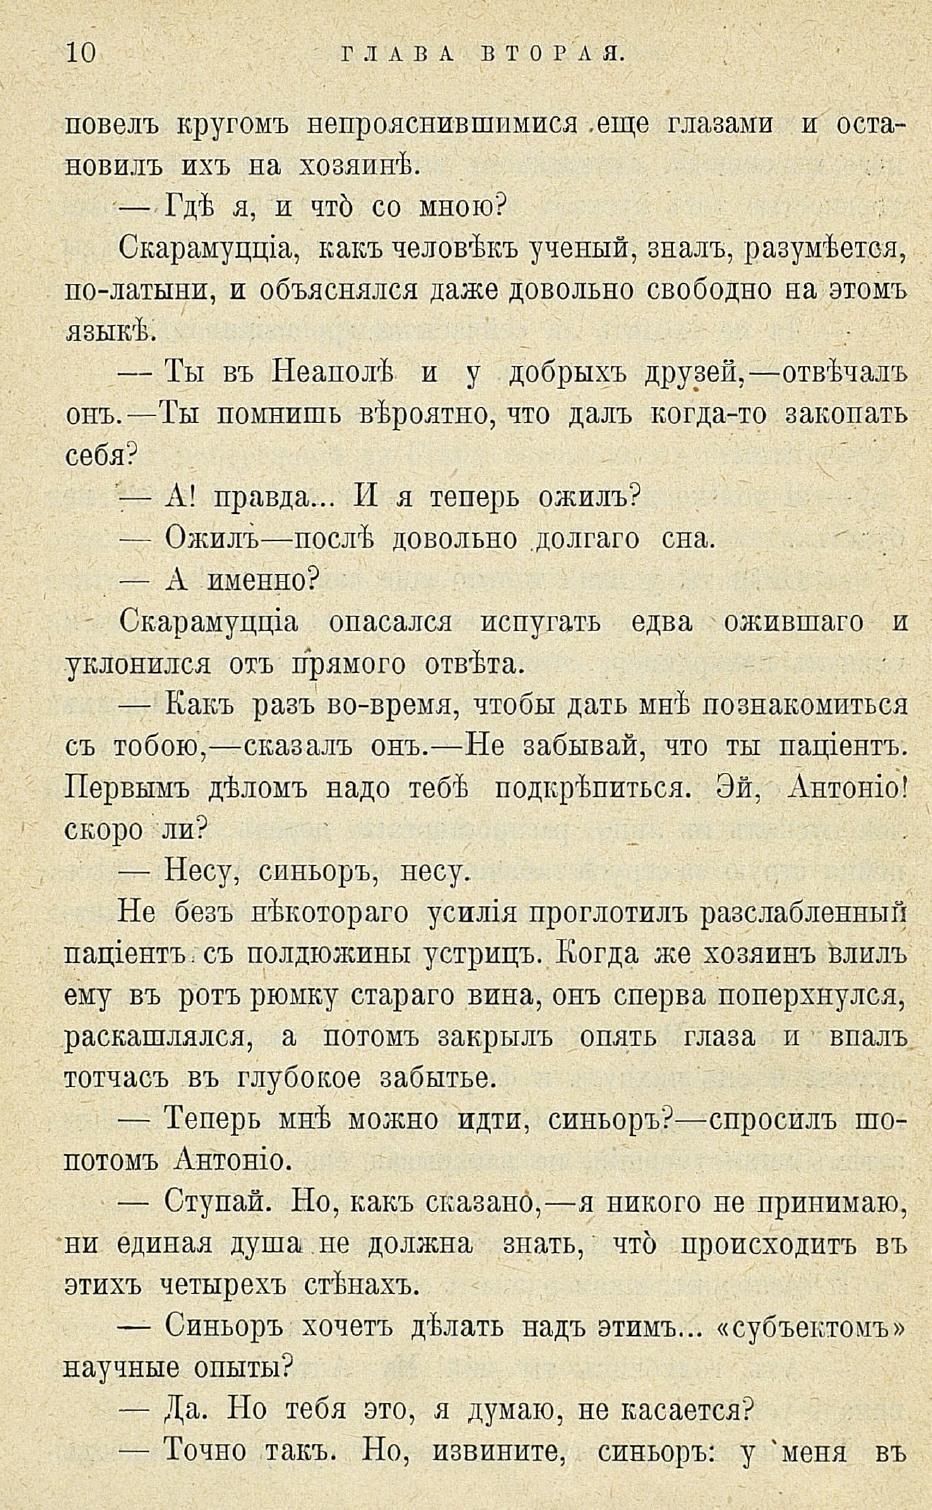 http://images.vfl.ru/ii/1407084893/35fc0351/5887475.jpg